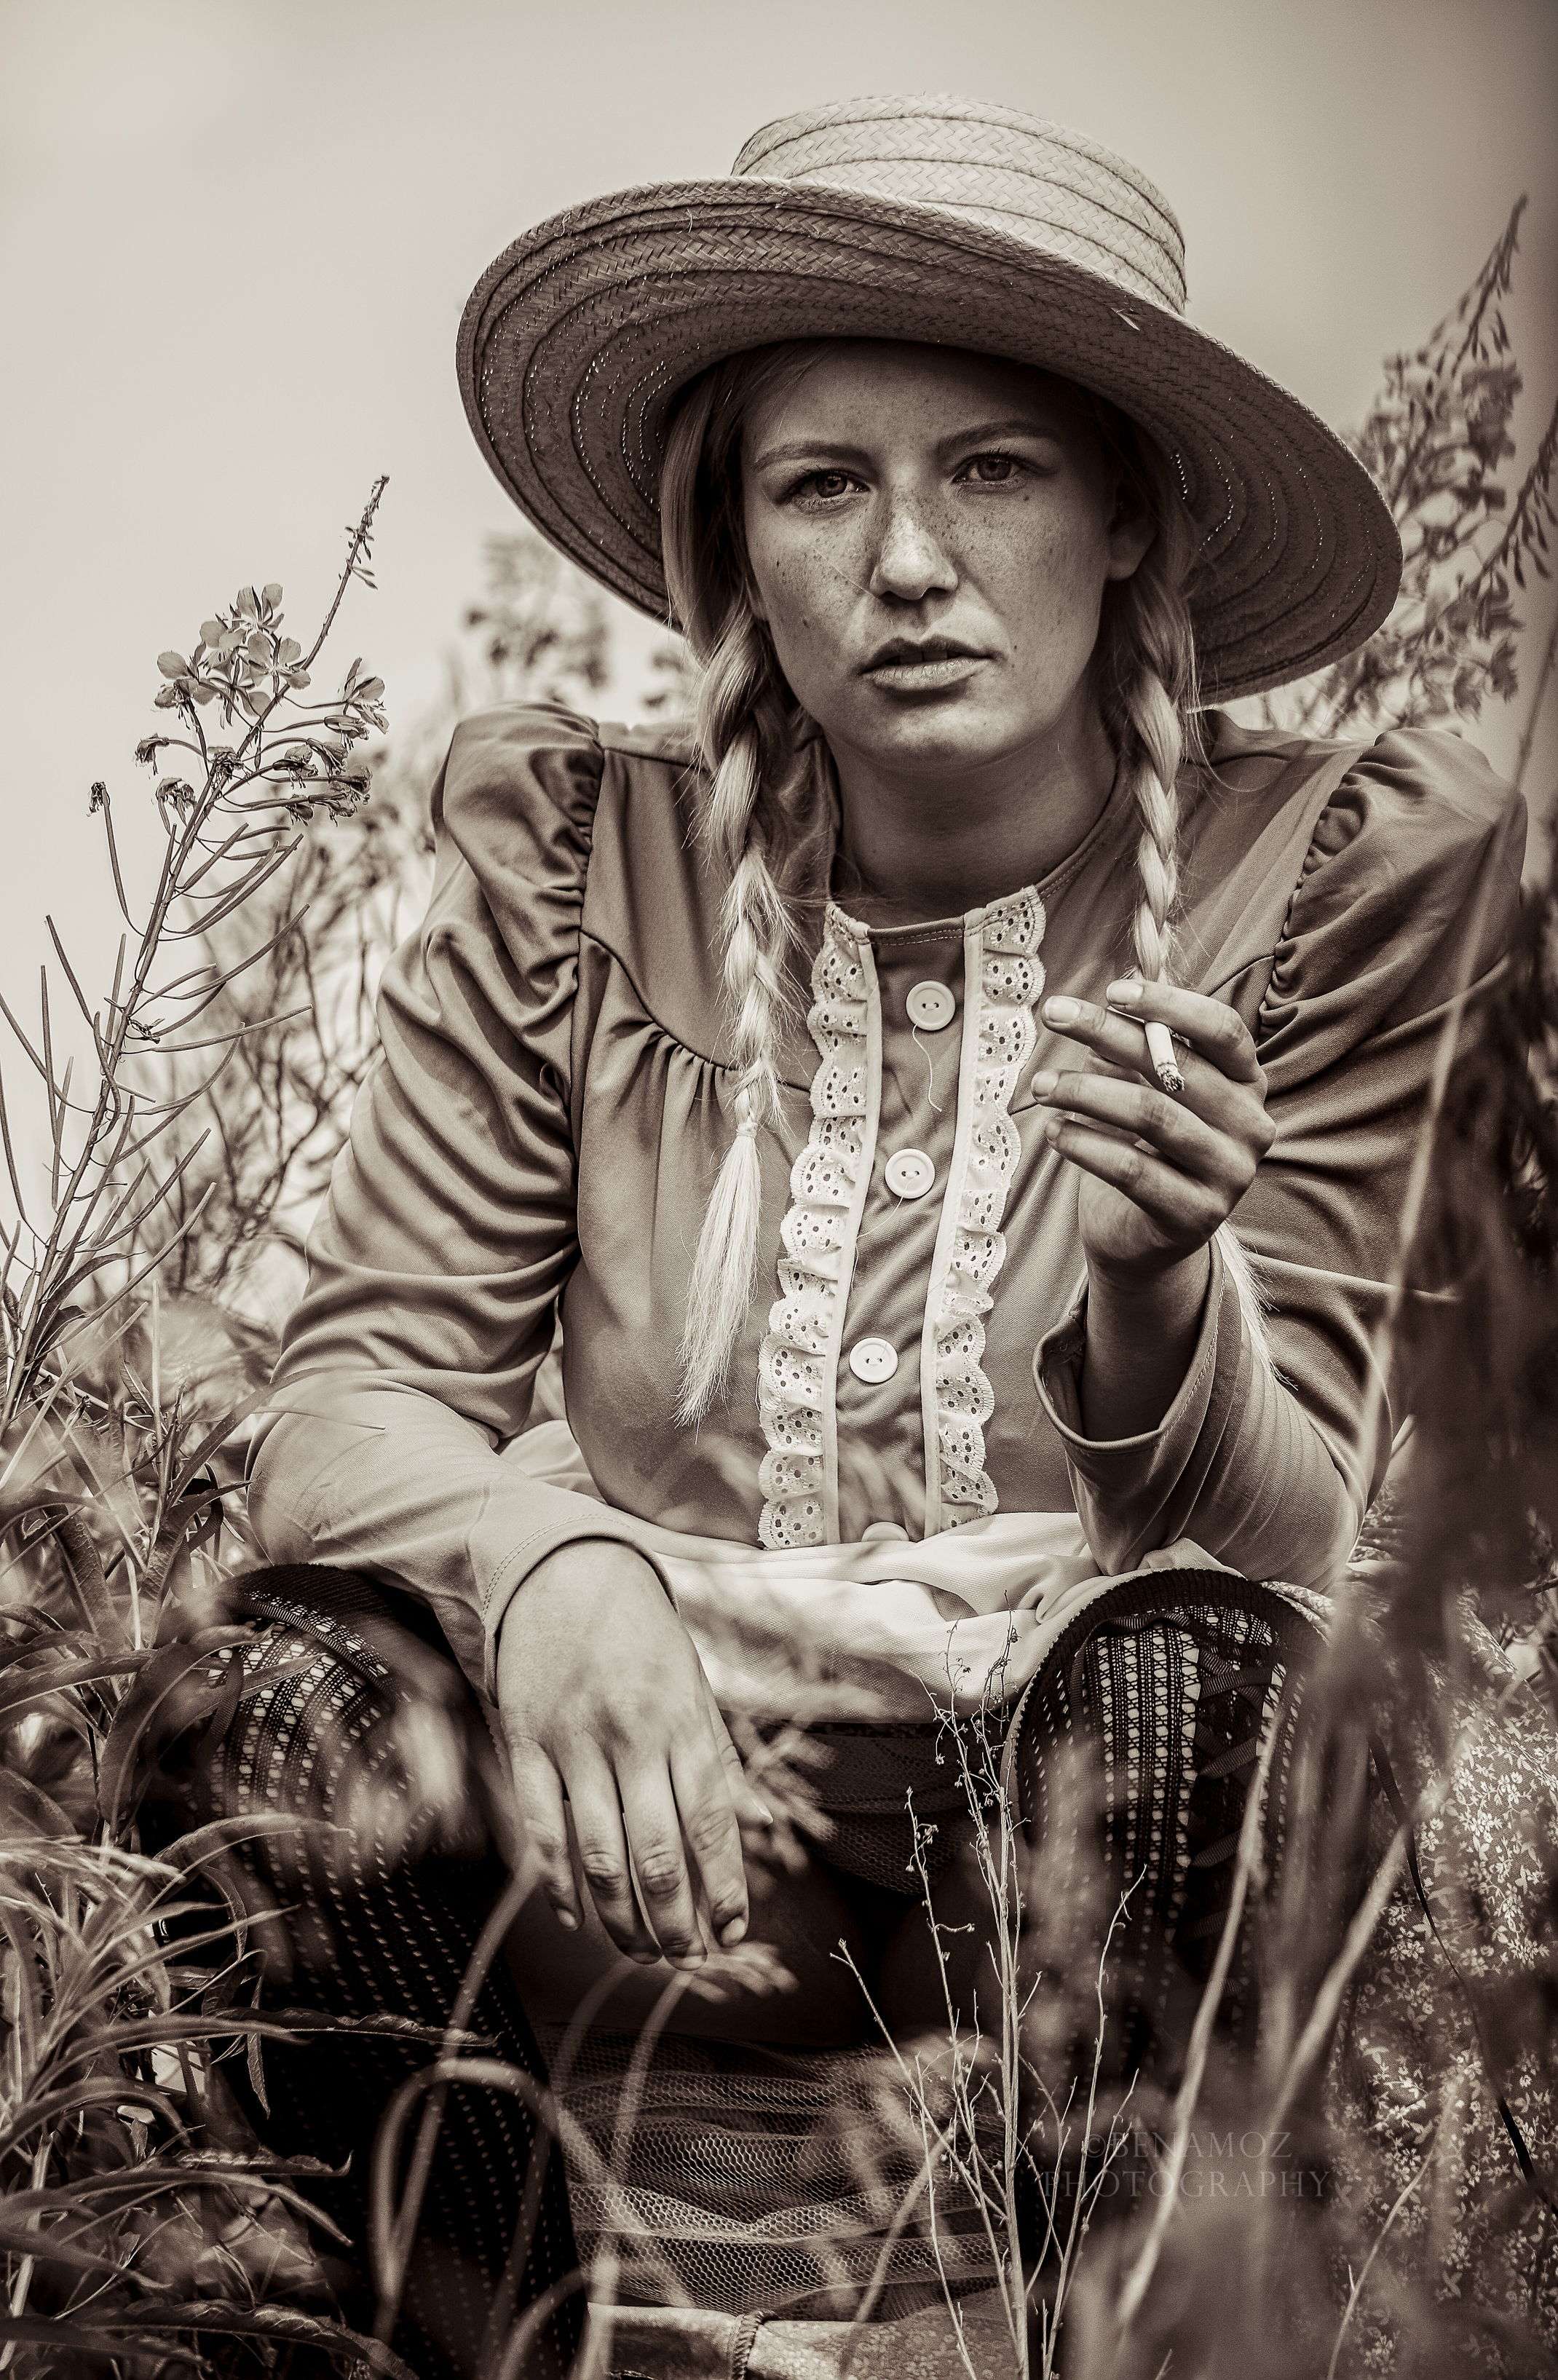 """Wild Woman"" by Photography by Benamoz Ltd."